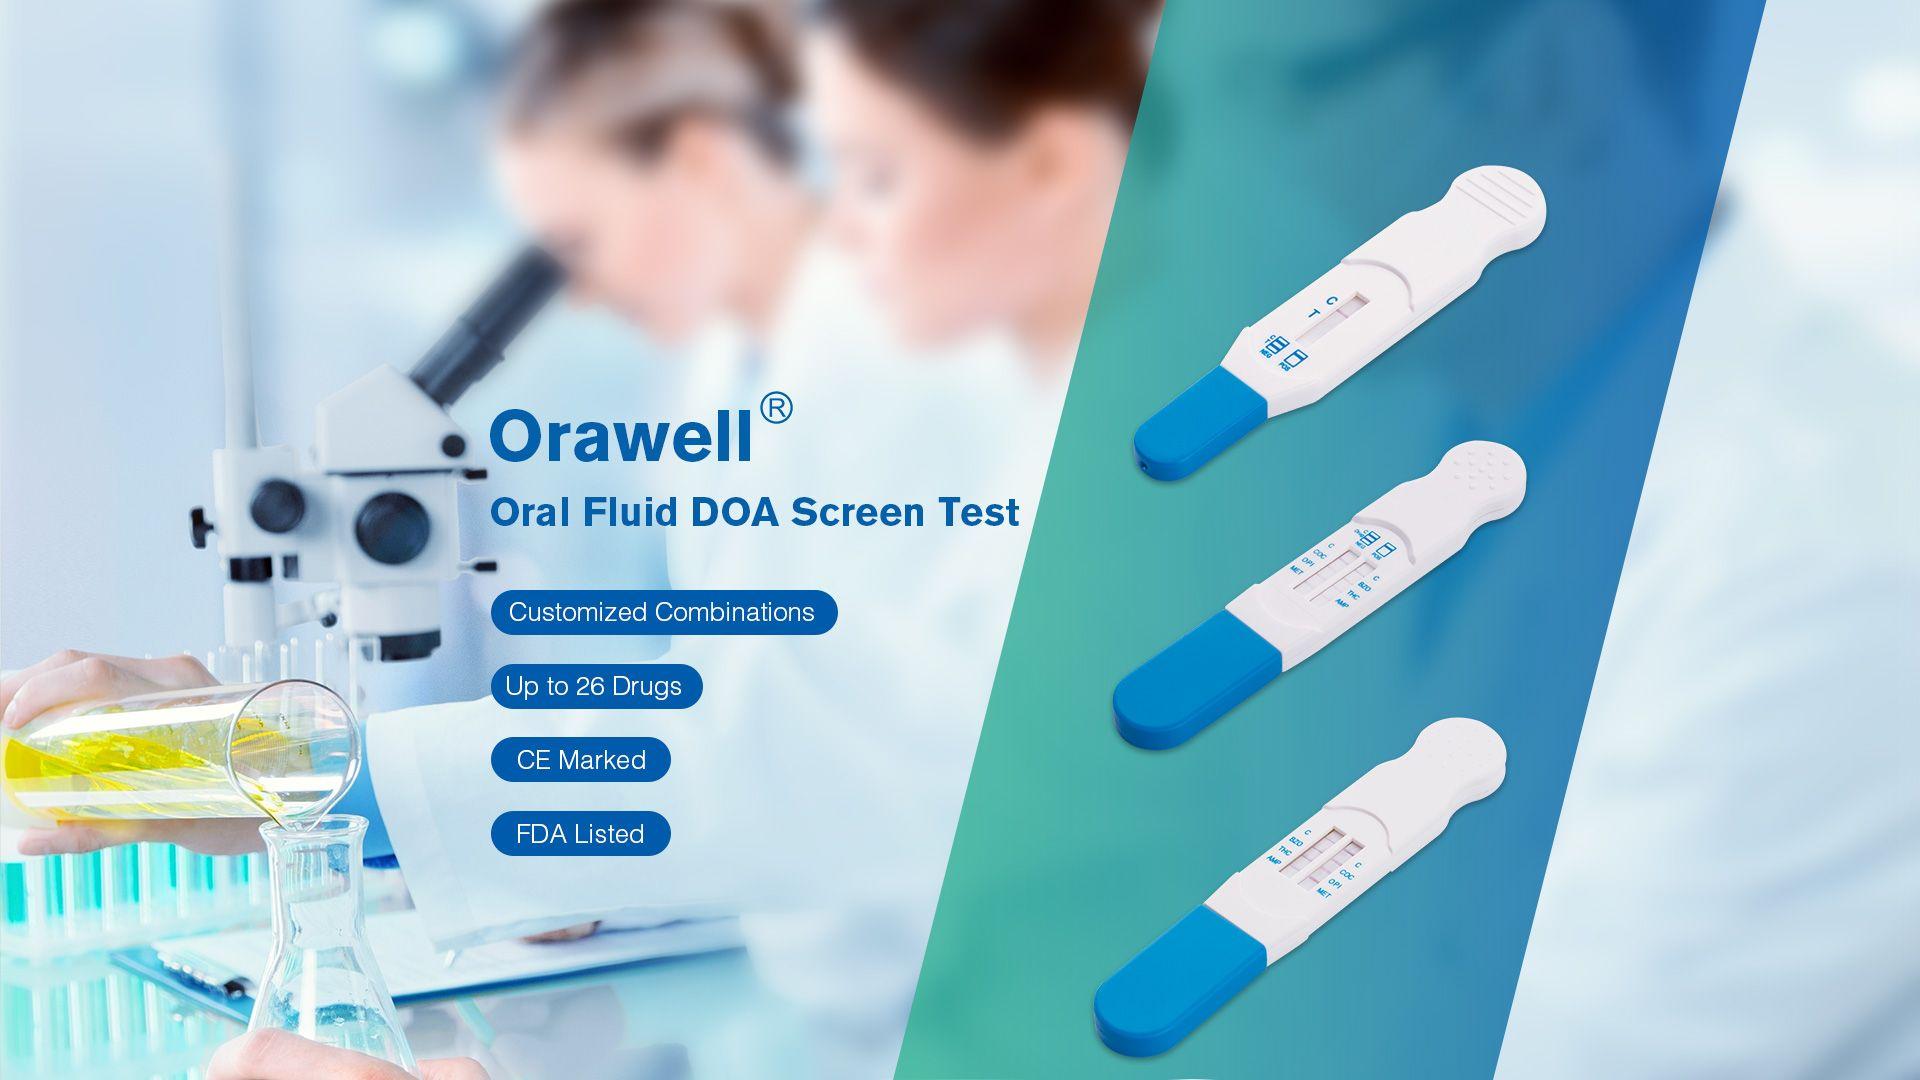 Orawell Oral Fluid DOA Screen Test